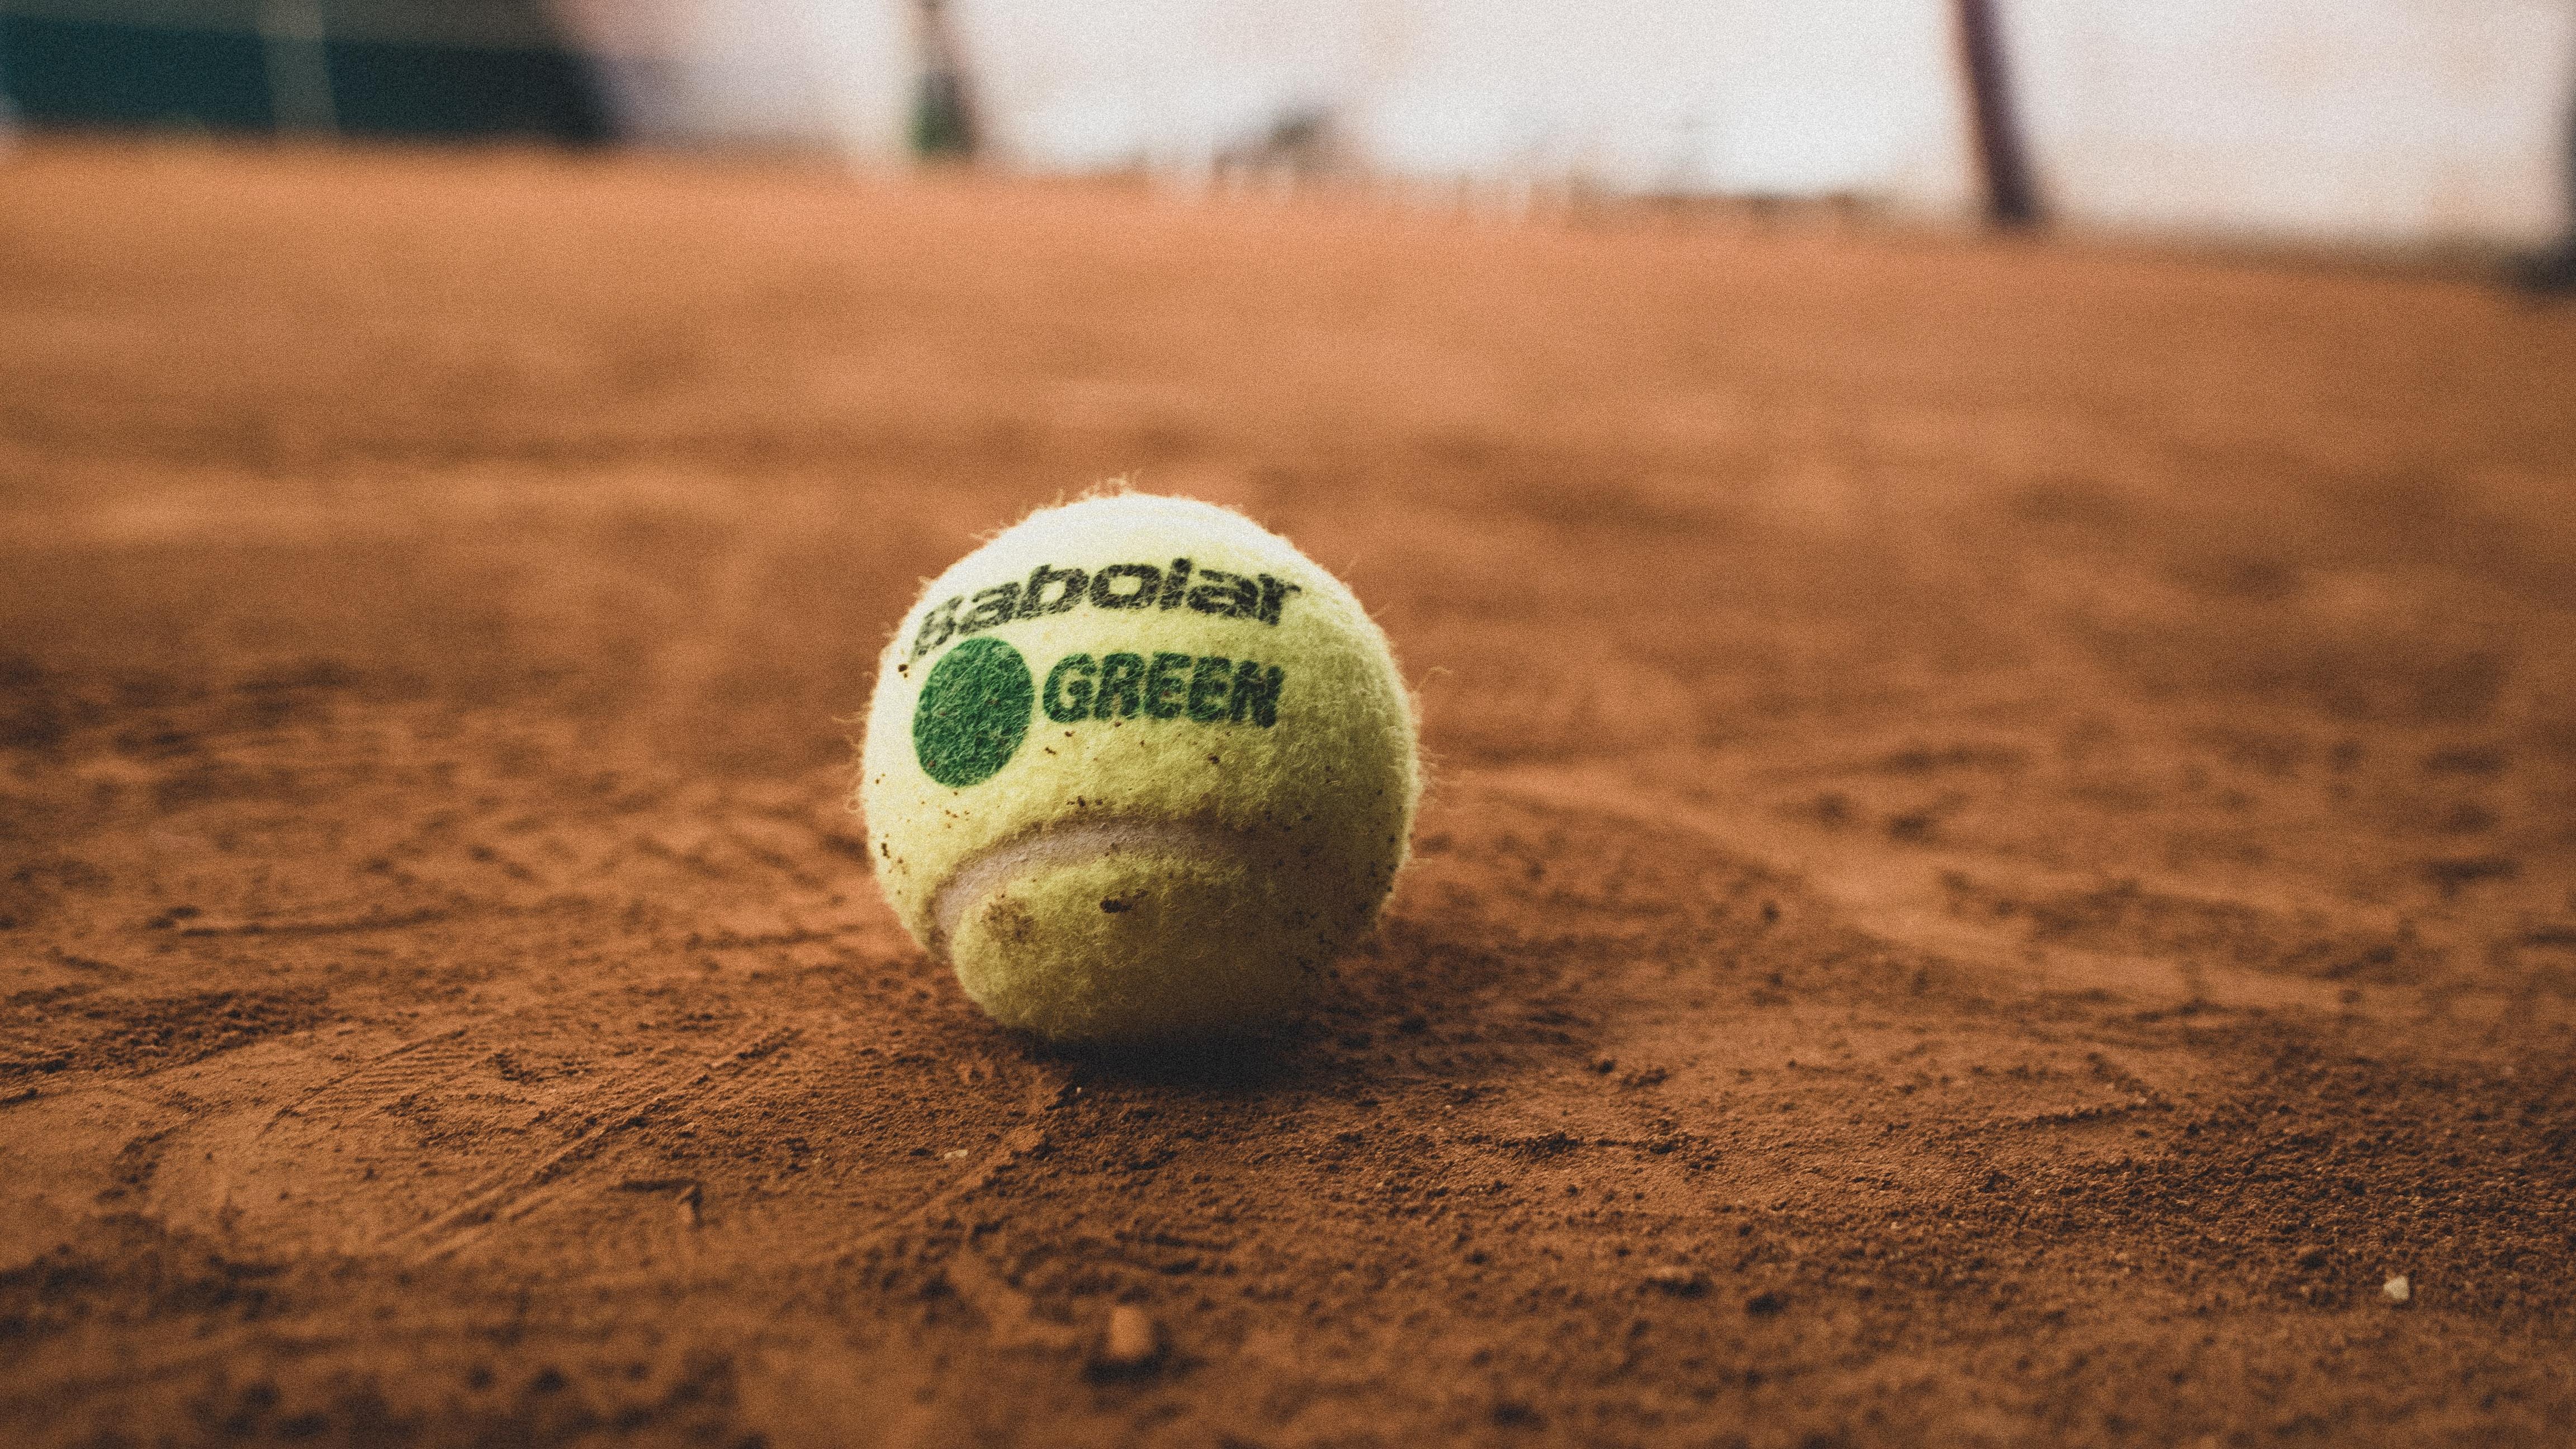 white and green baseball ball